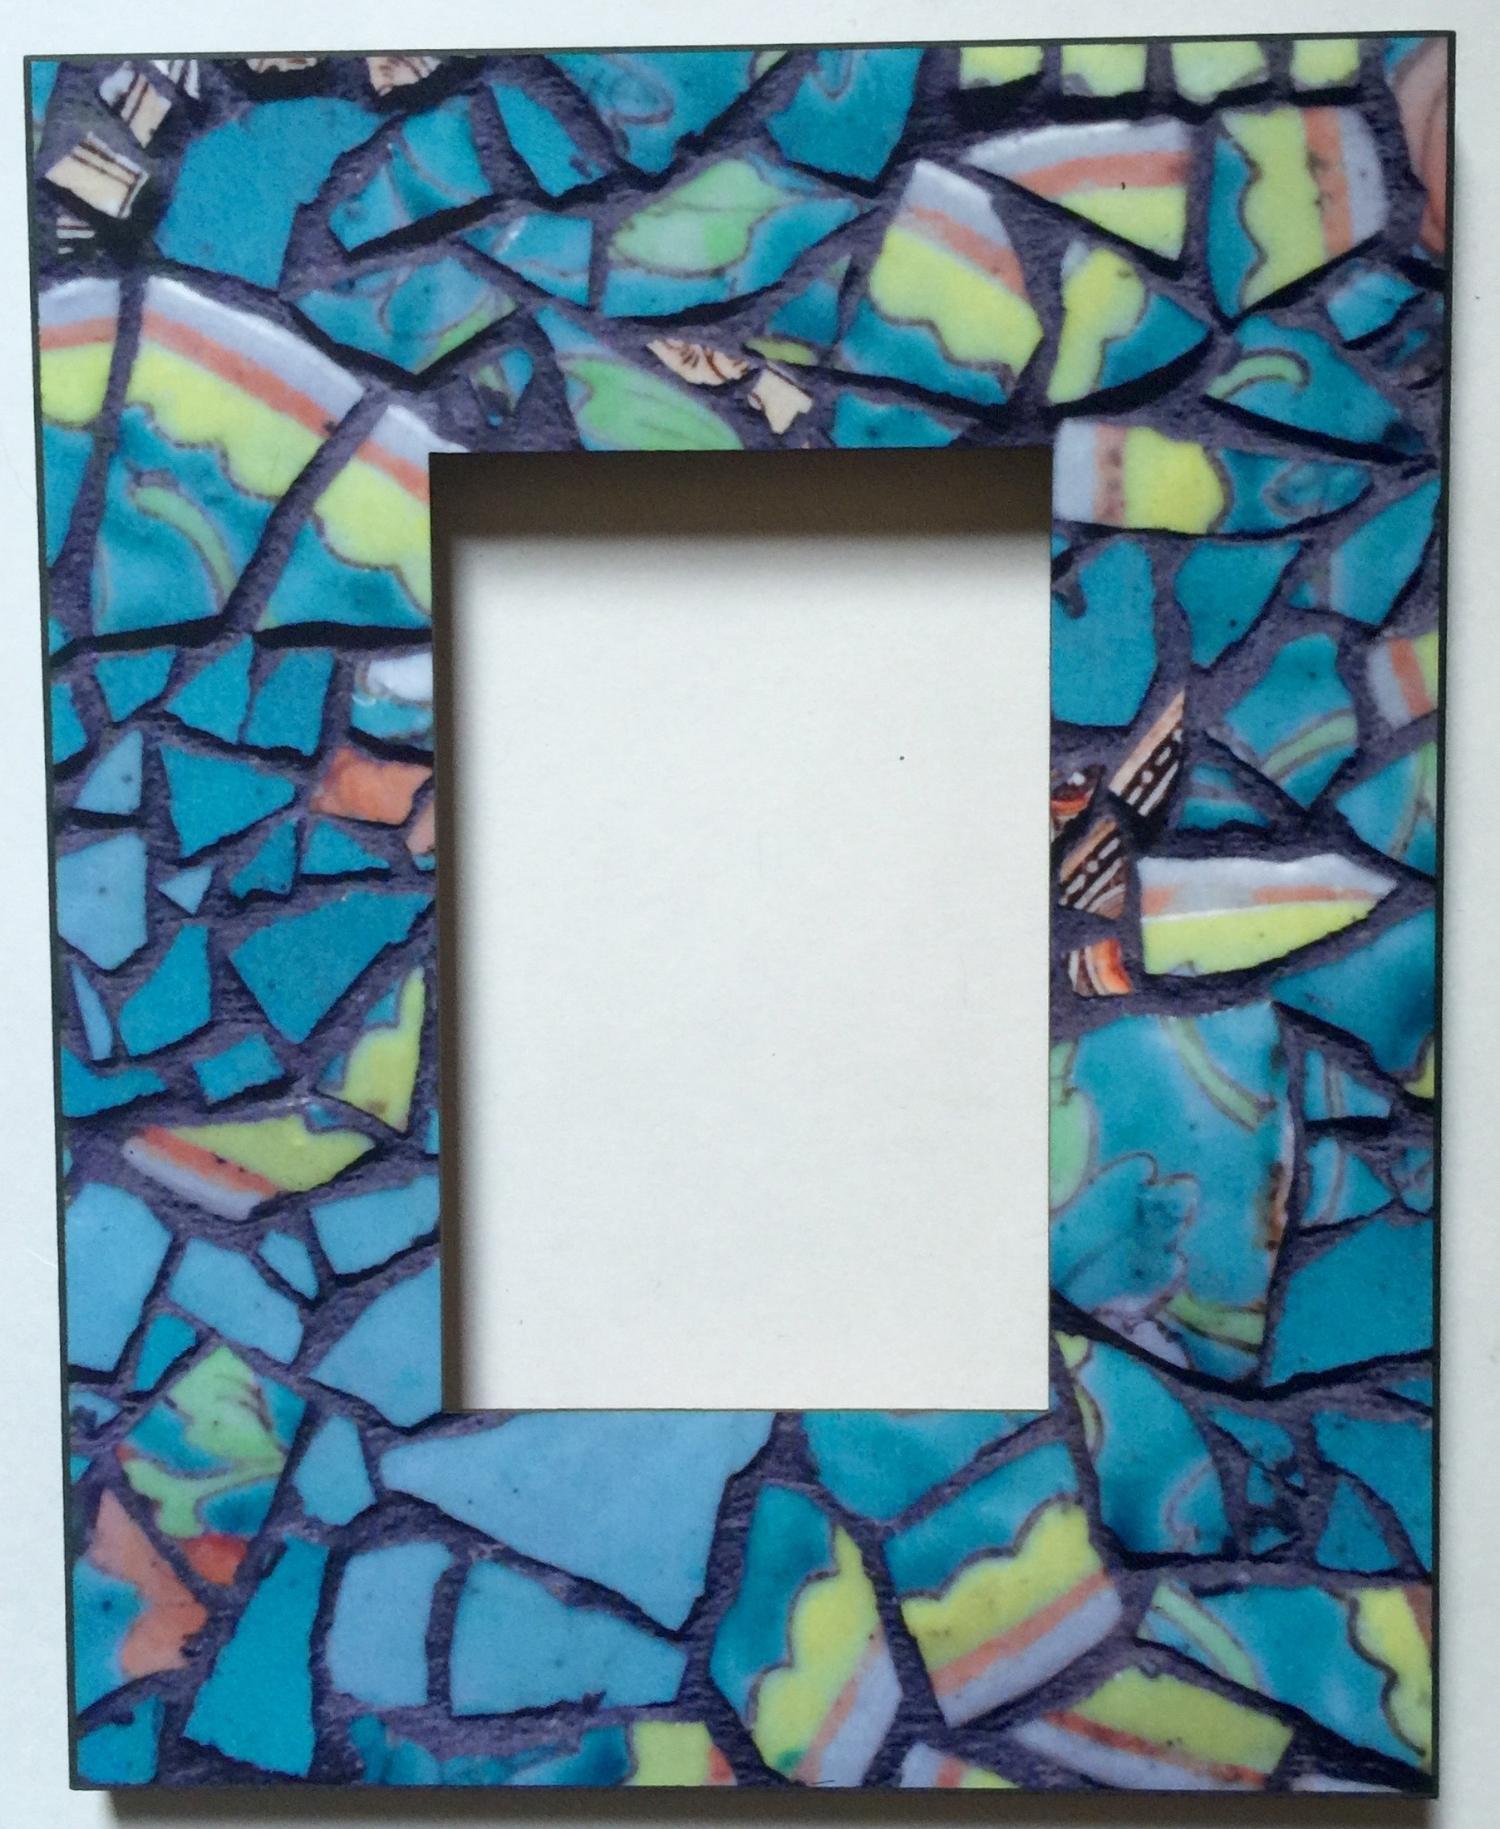 Mosaic Printed Frame 4x6 $65